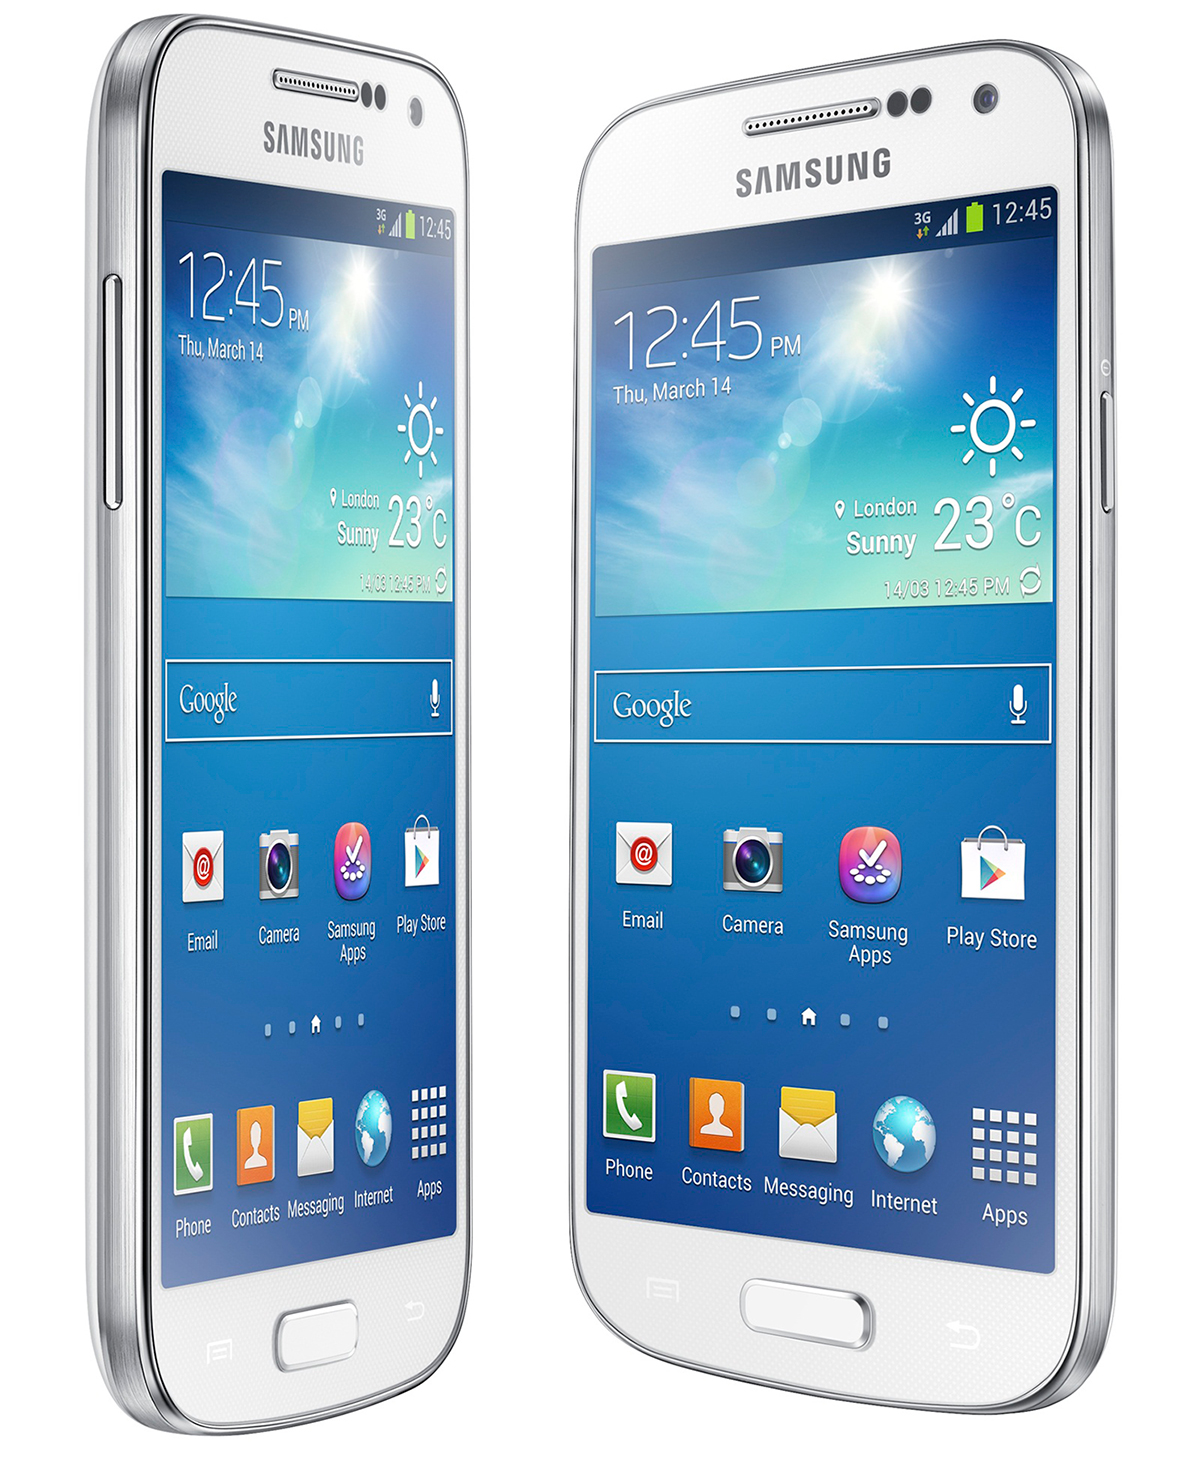 samsung galaxy s4 mini full phone specifications comparison. Black Bedroom Furniture Sets. Home Design Ideas